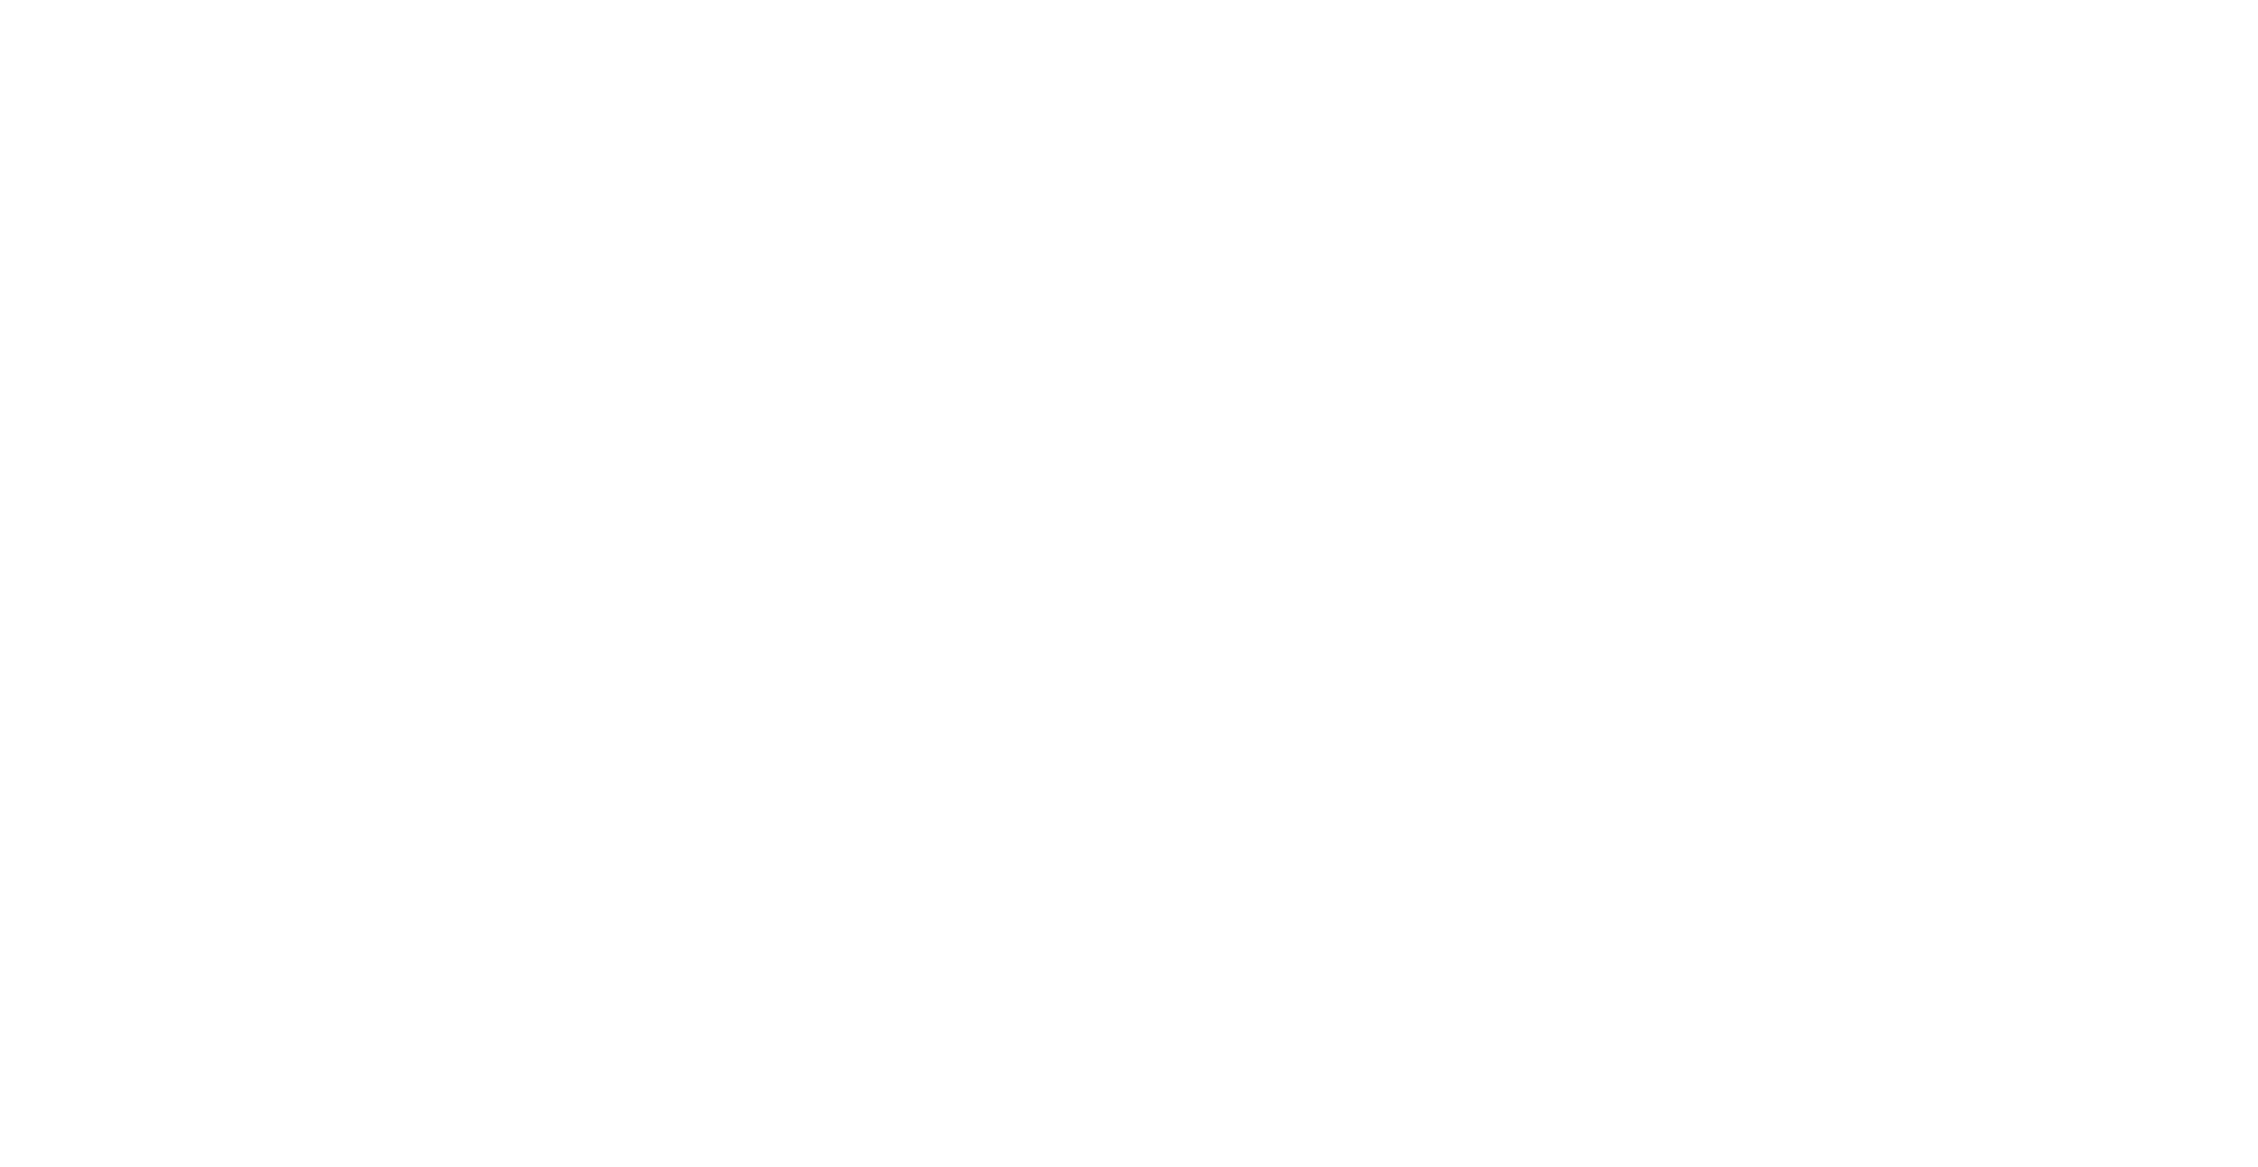 ns_logo_landscape_white.png